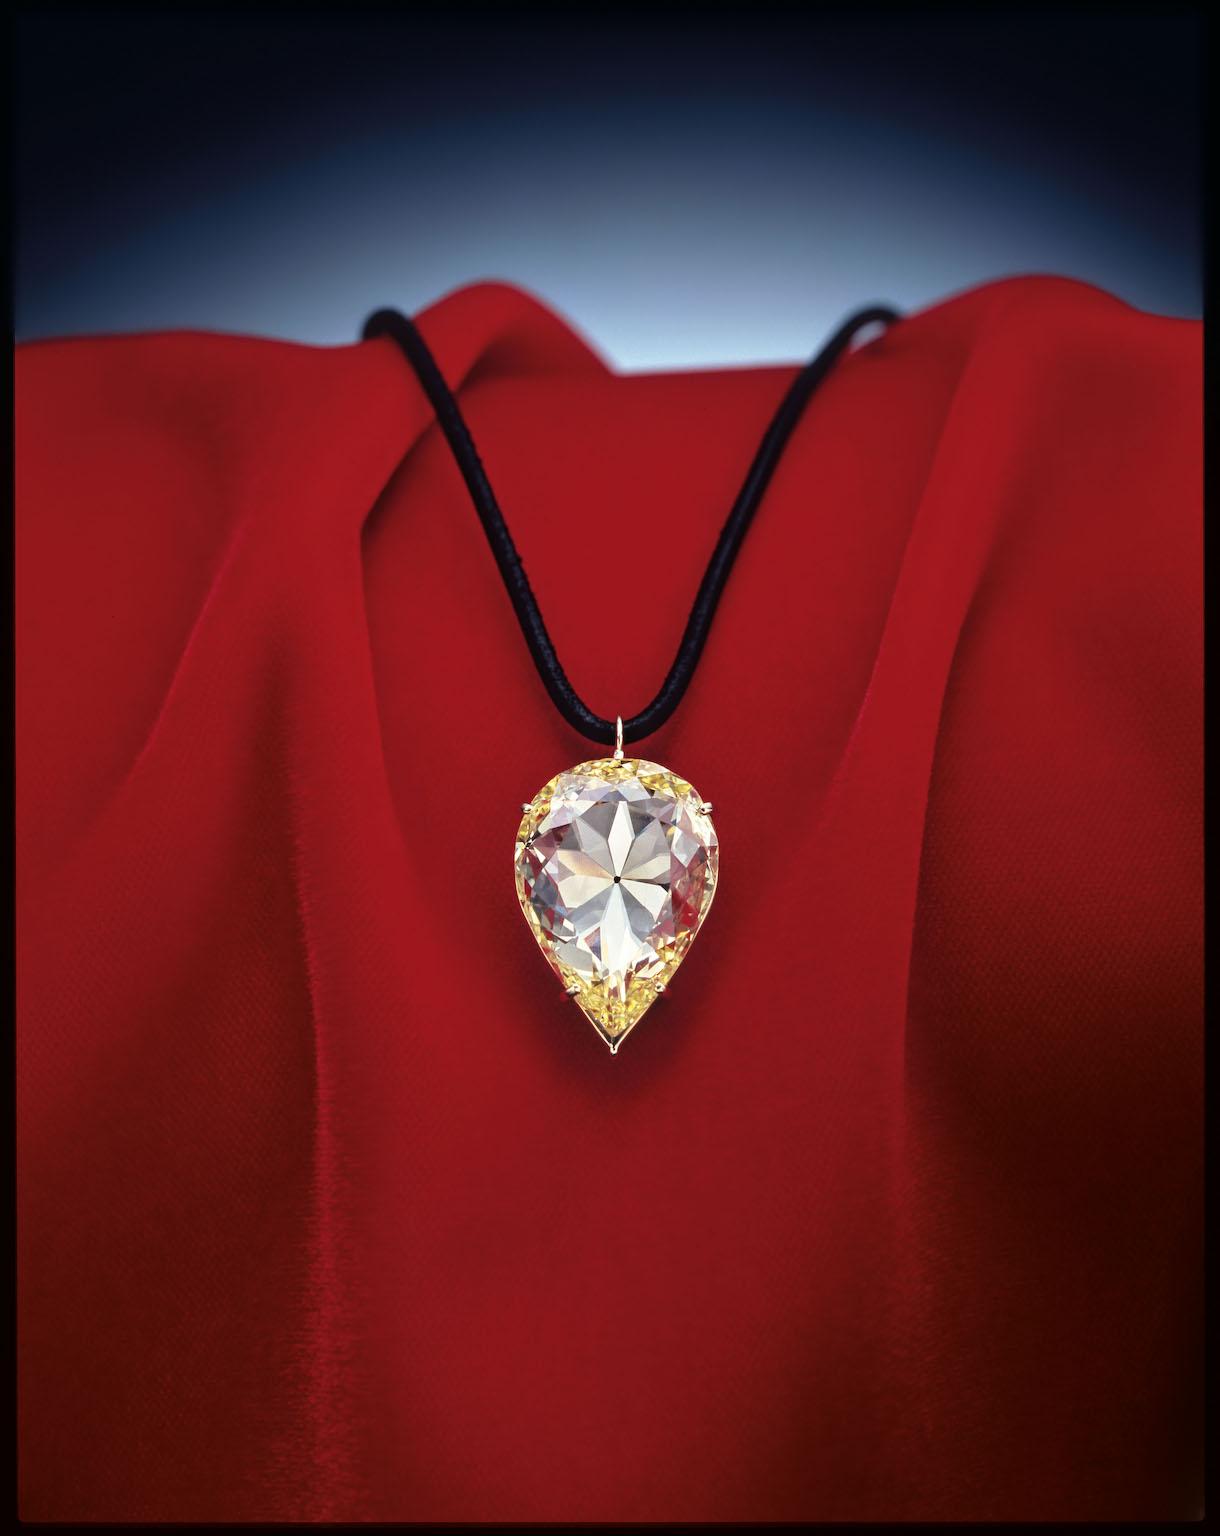 moon of baroda necklace christie's